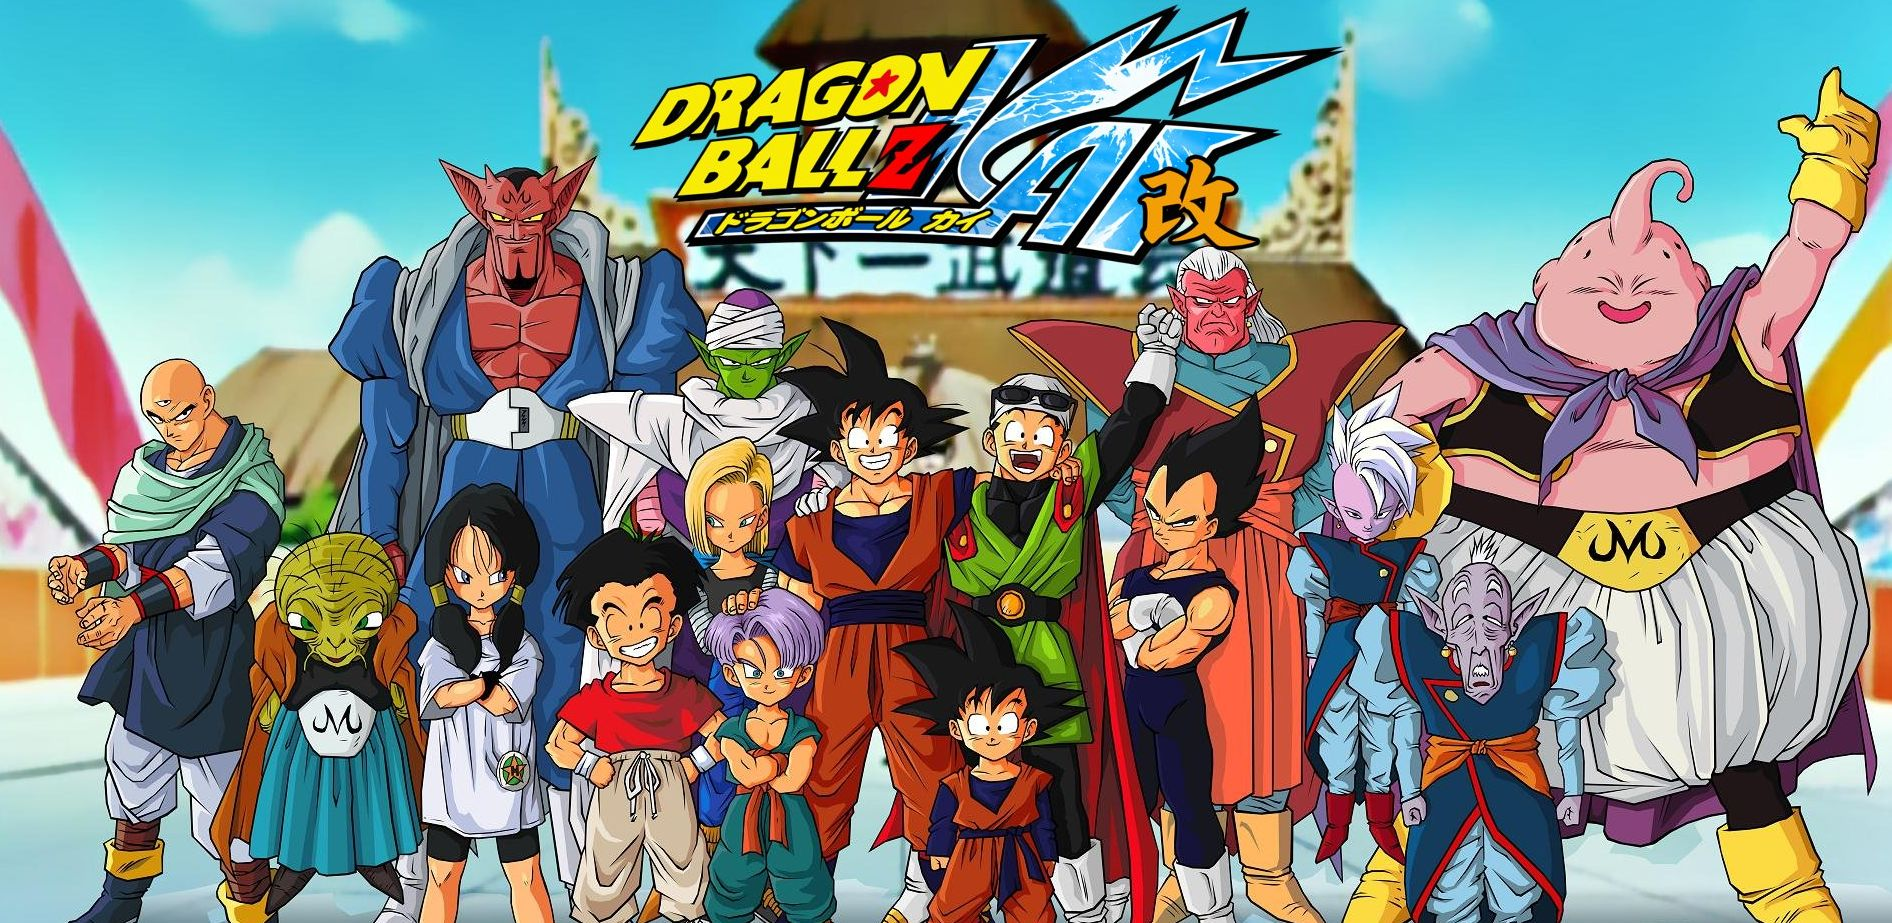 dragon ball z kai finally releasing the english dub of the buu saga